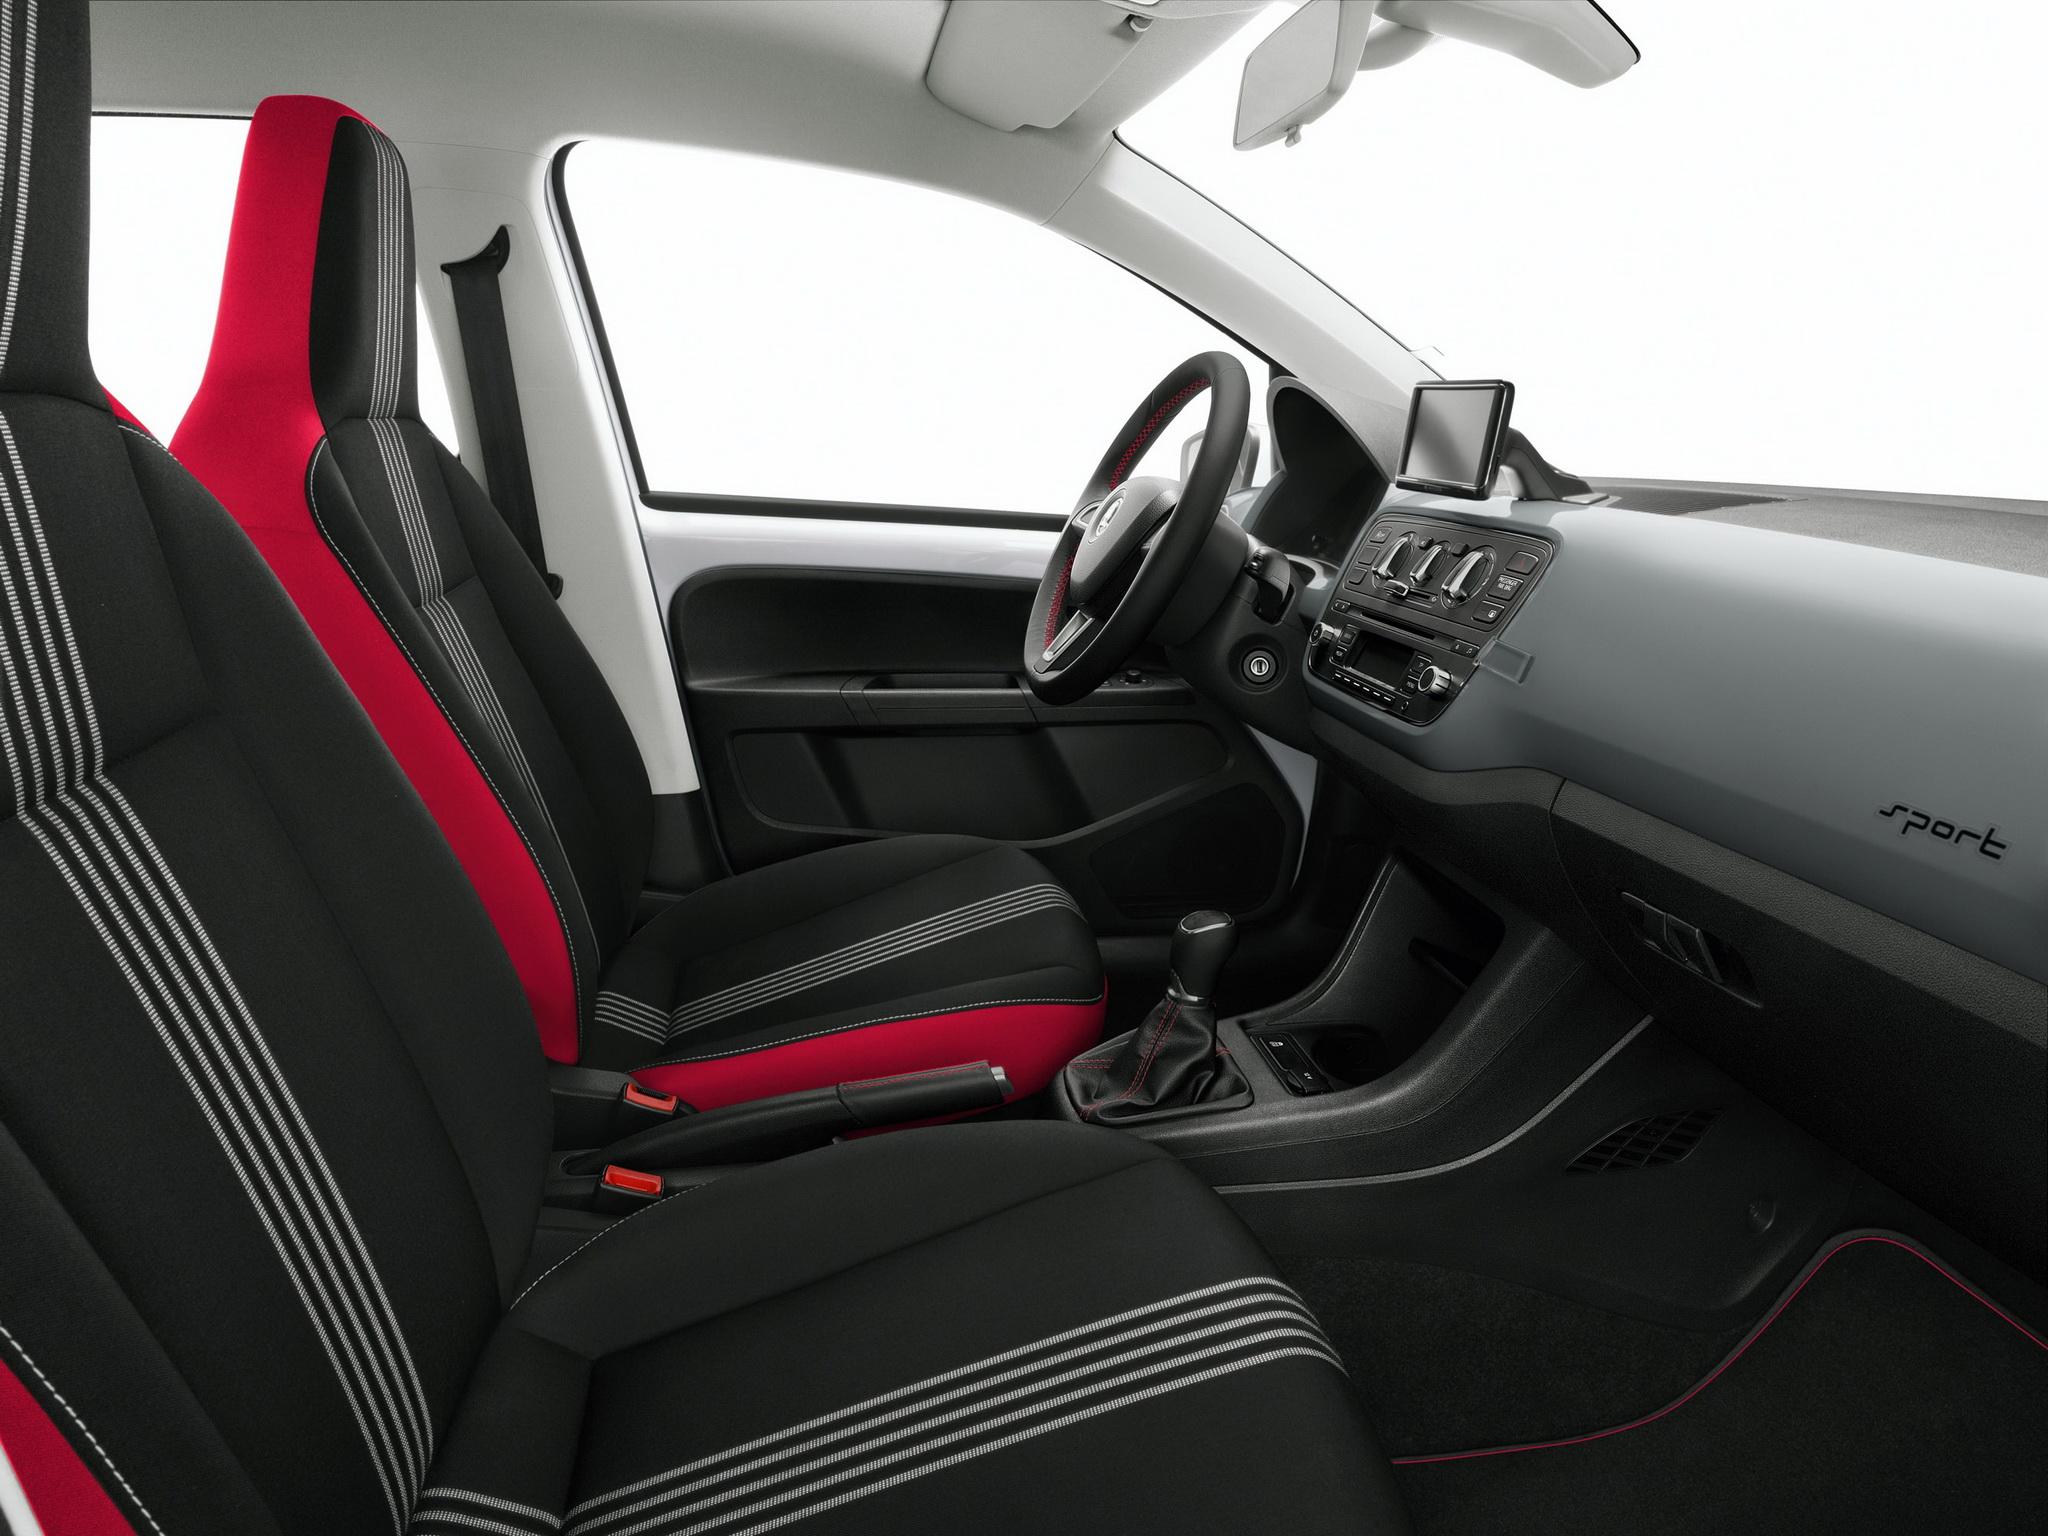 Skoda Monte Carlo >> Skoda Citigo Monte Carlo Launched with Rally Ace Looks and No Power - autoevolution